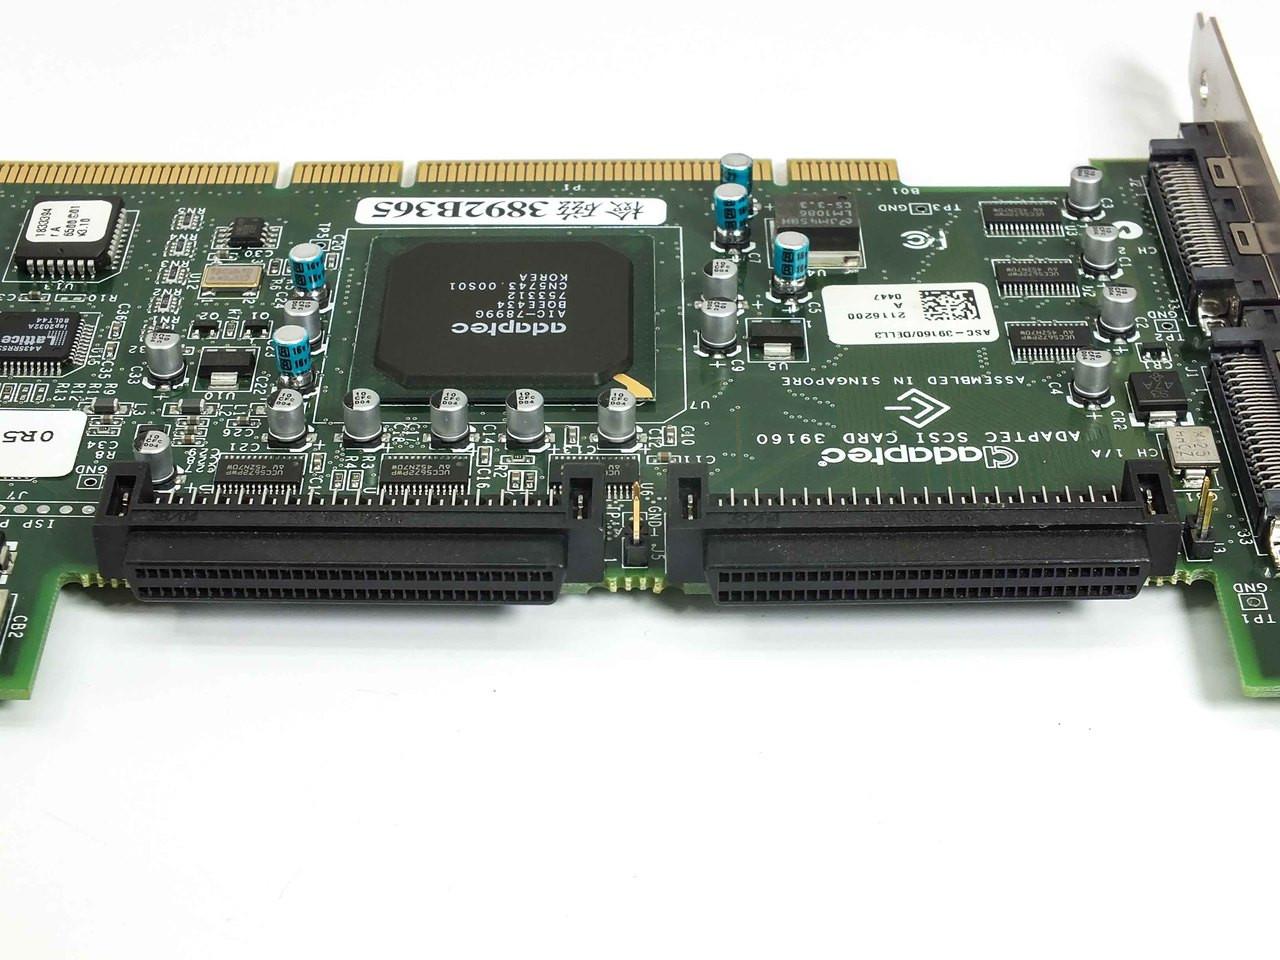 ADAPTEC AIC-7899 ULTRA160 PCI SCSI DRIVER FOR WINDOWS 8